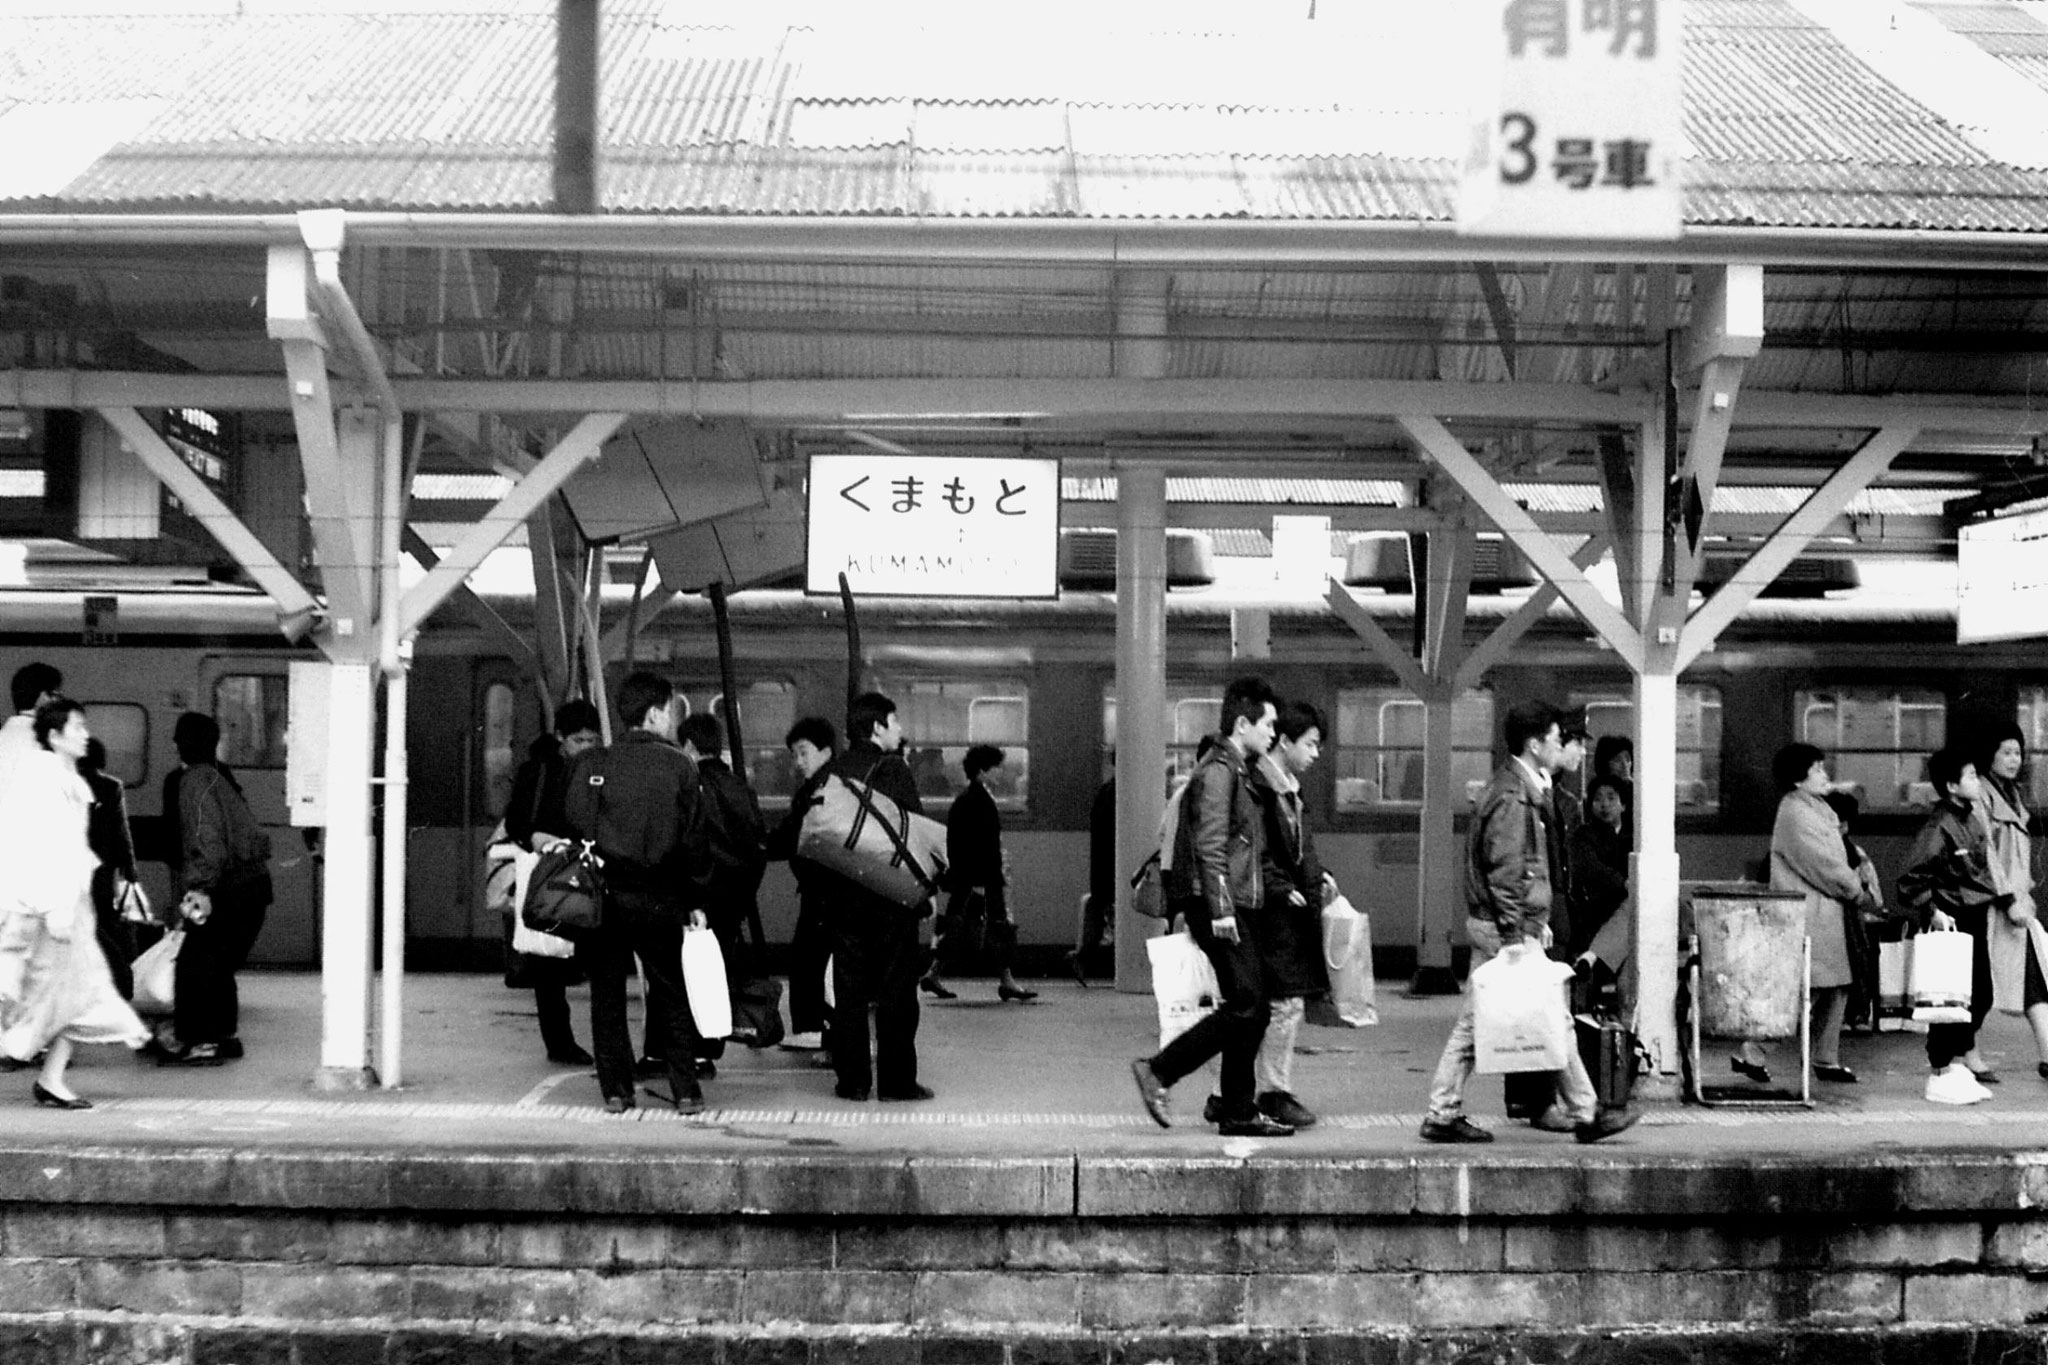 22/1/1989: 25: Kumamoto Station